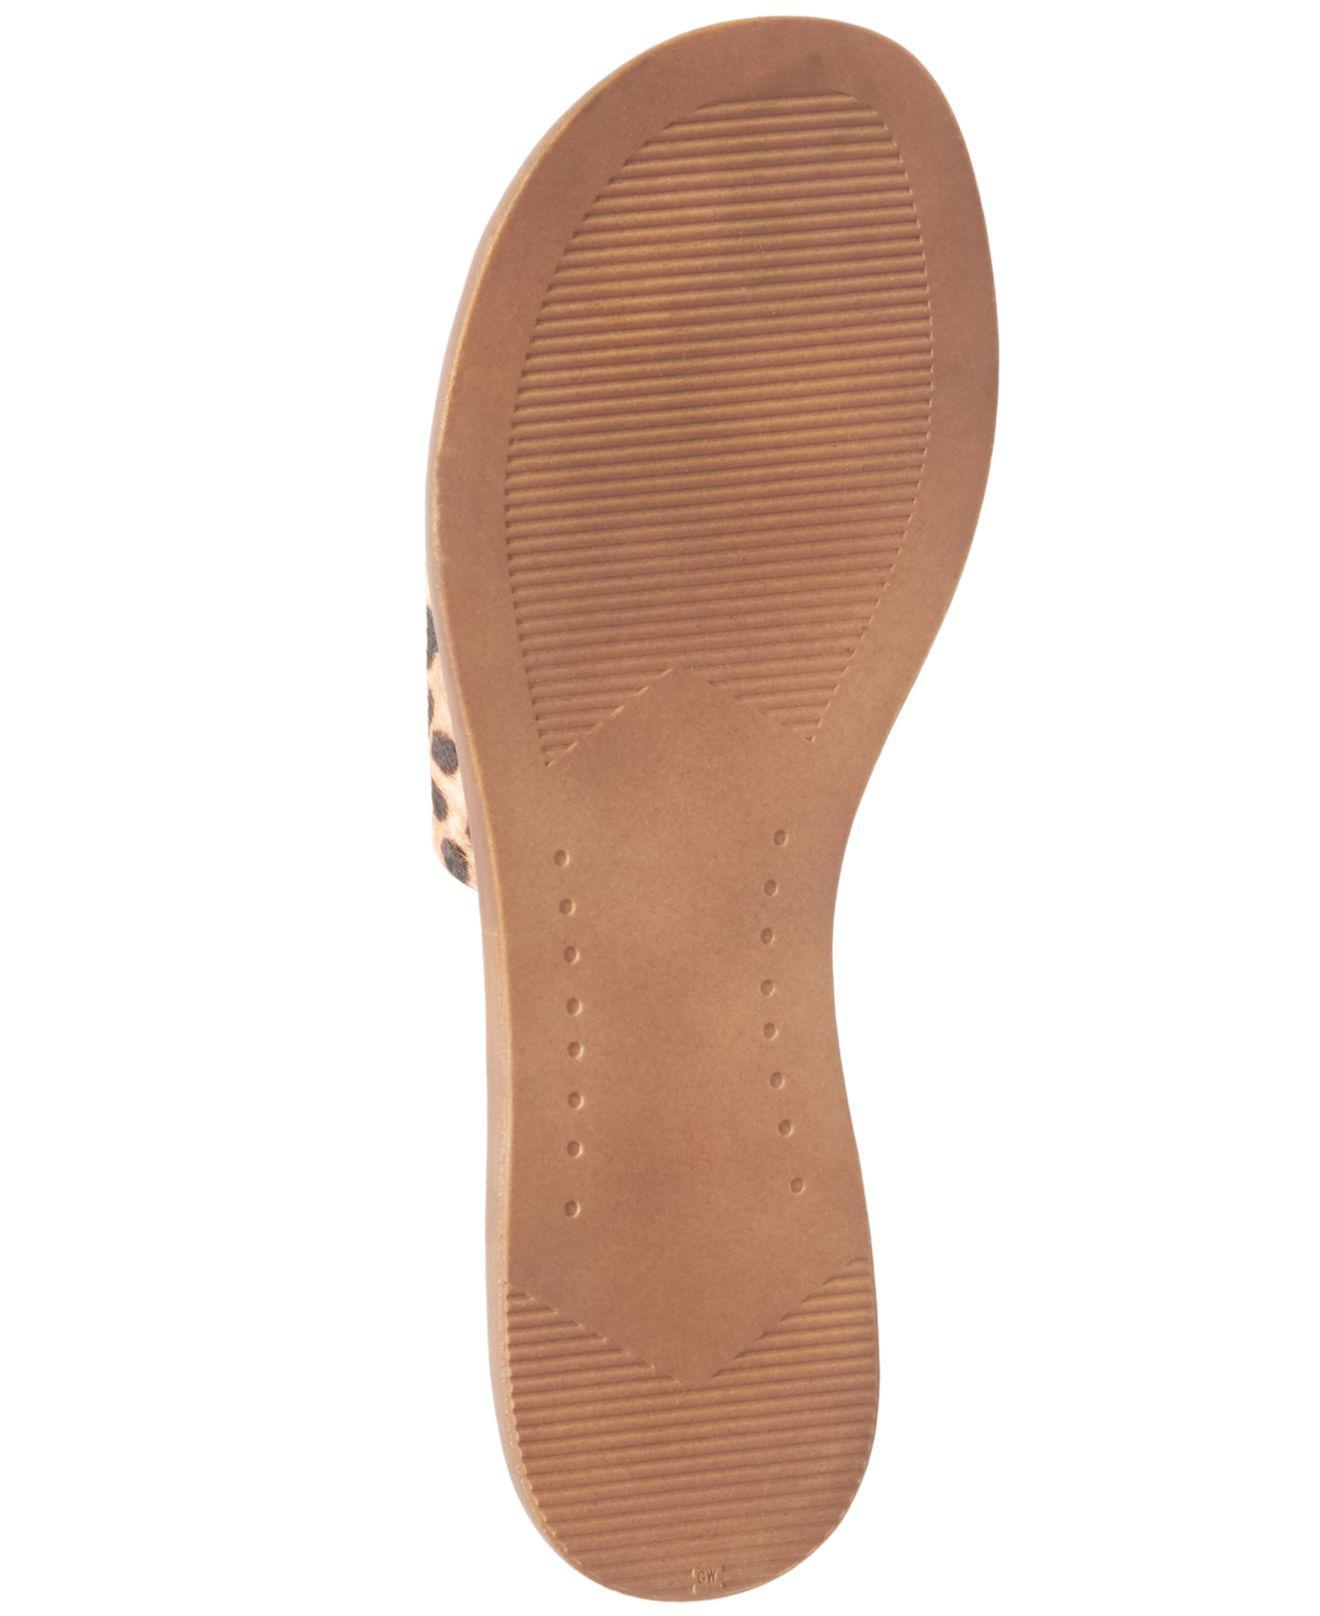 88fdb9c406a Lyst - Steve Madden Camilla Banded Slide Sandals